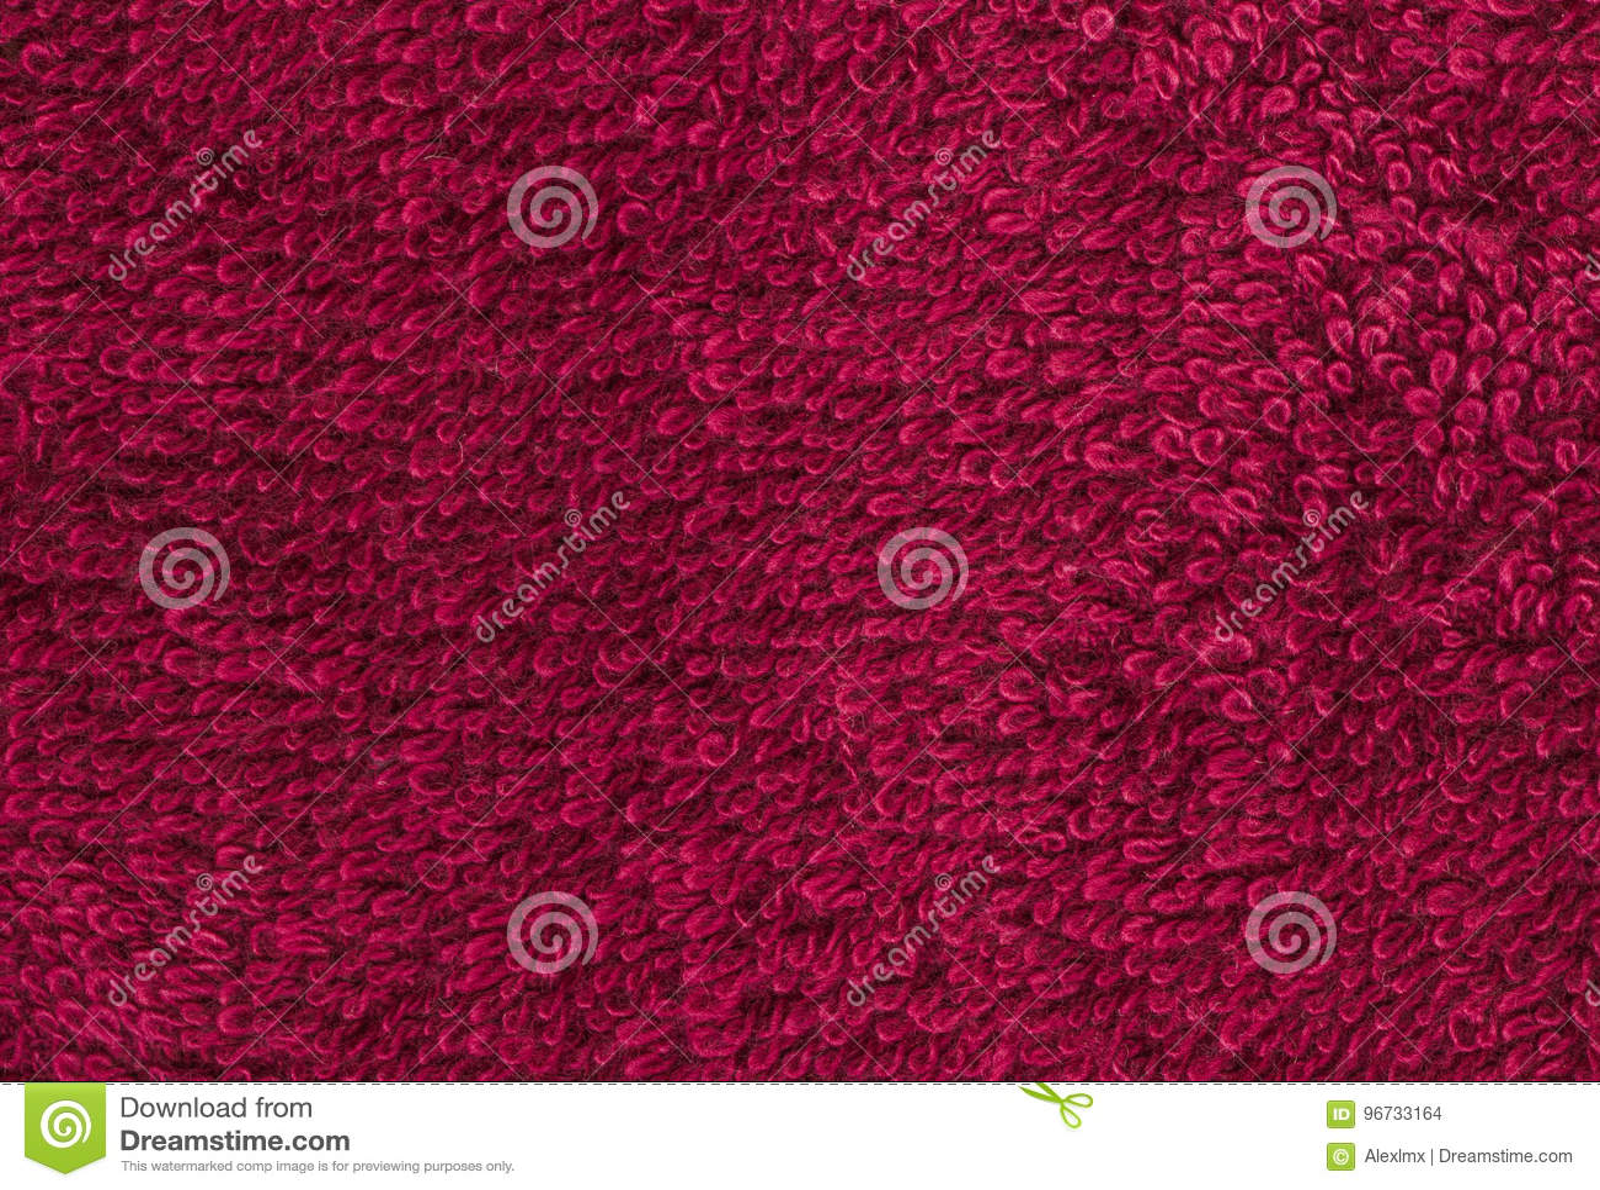 terrycloth red closeup fabric texture background high resoluti